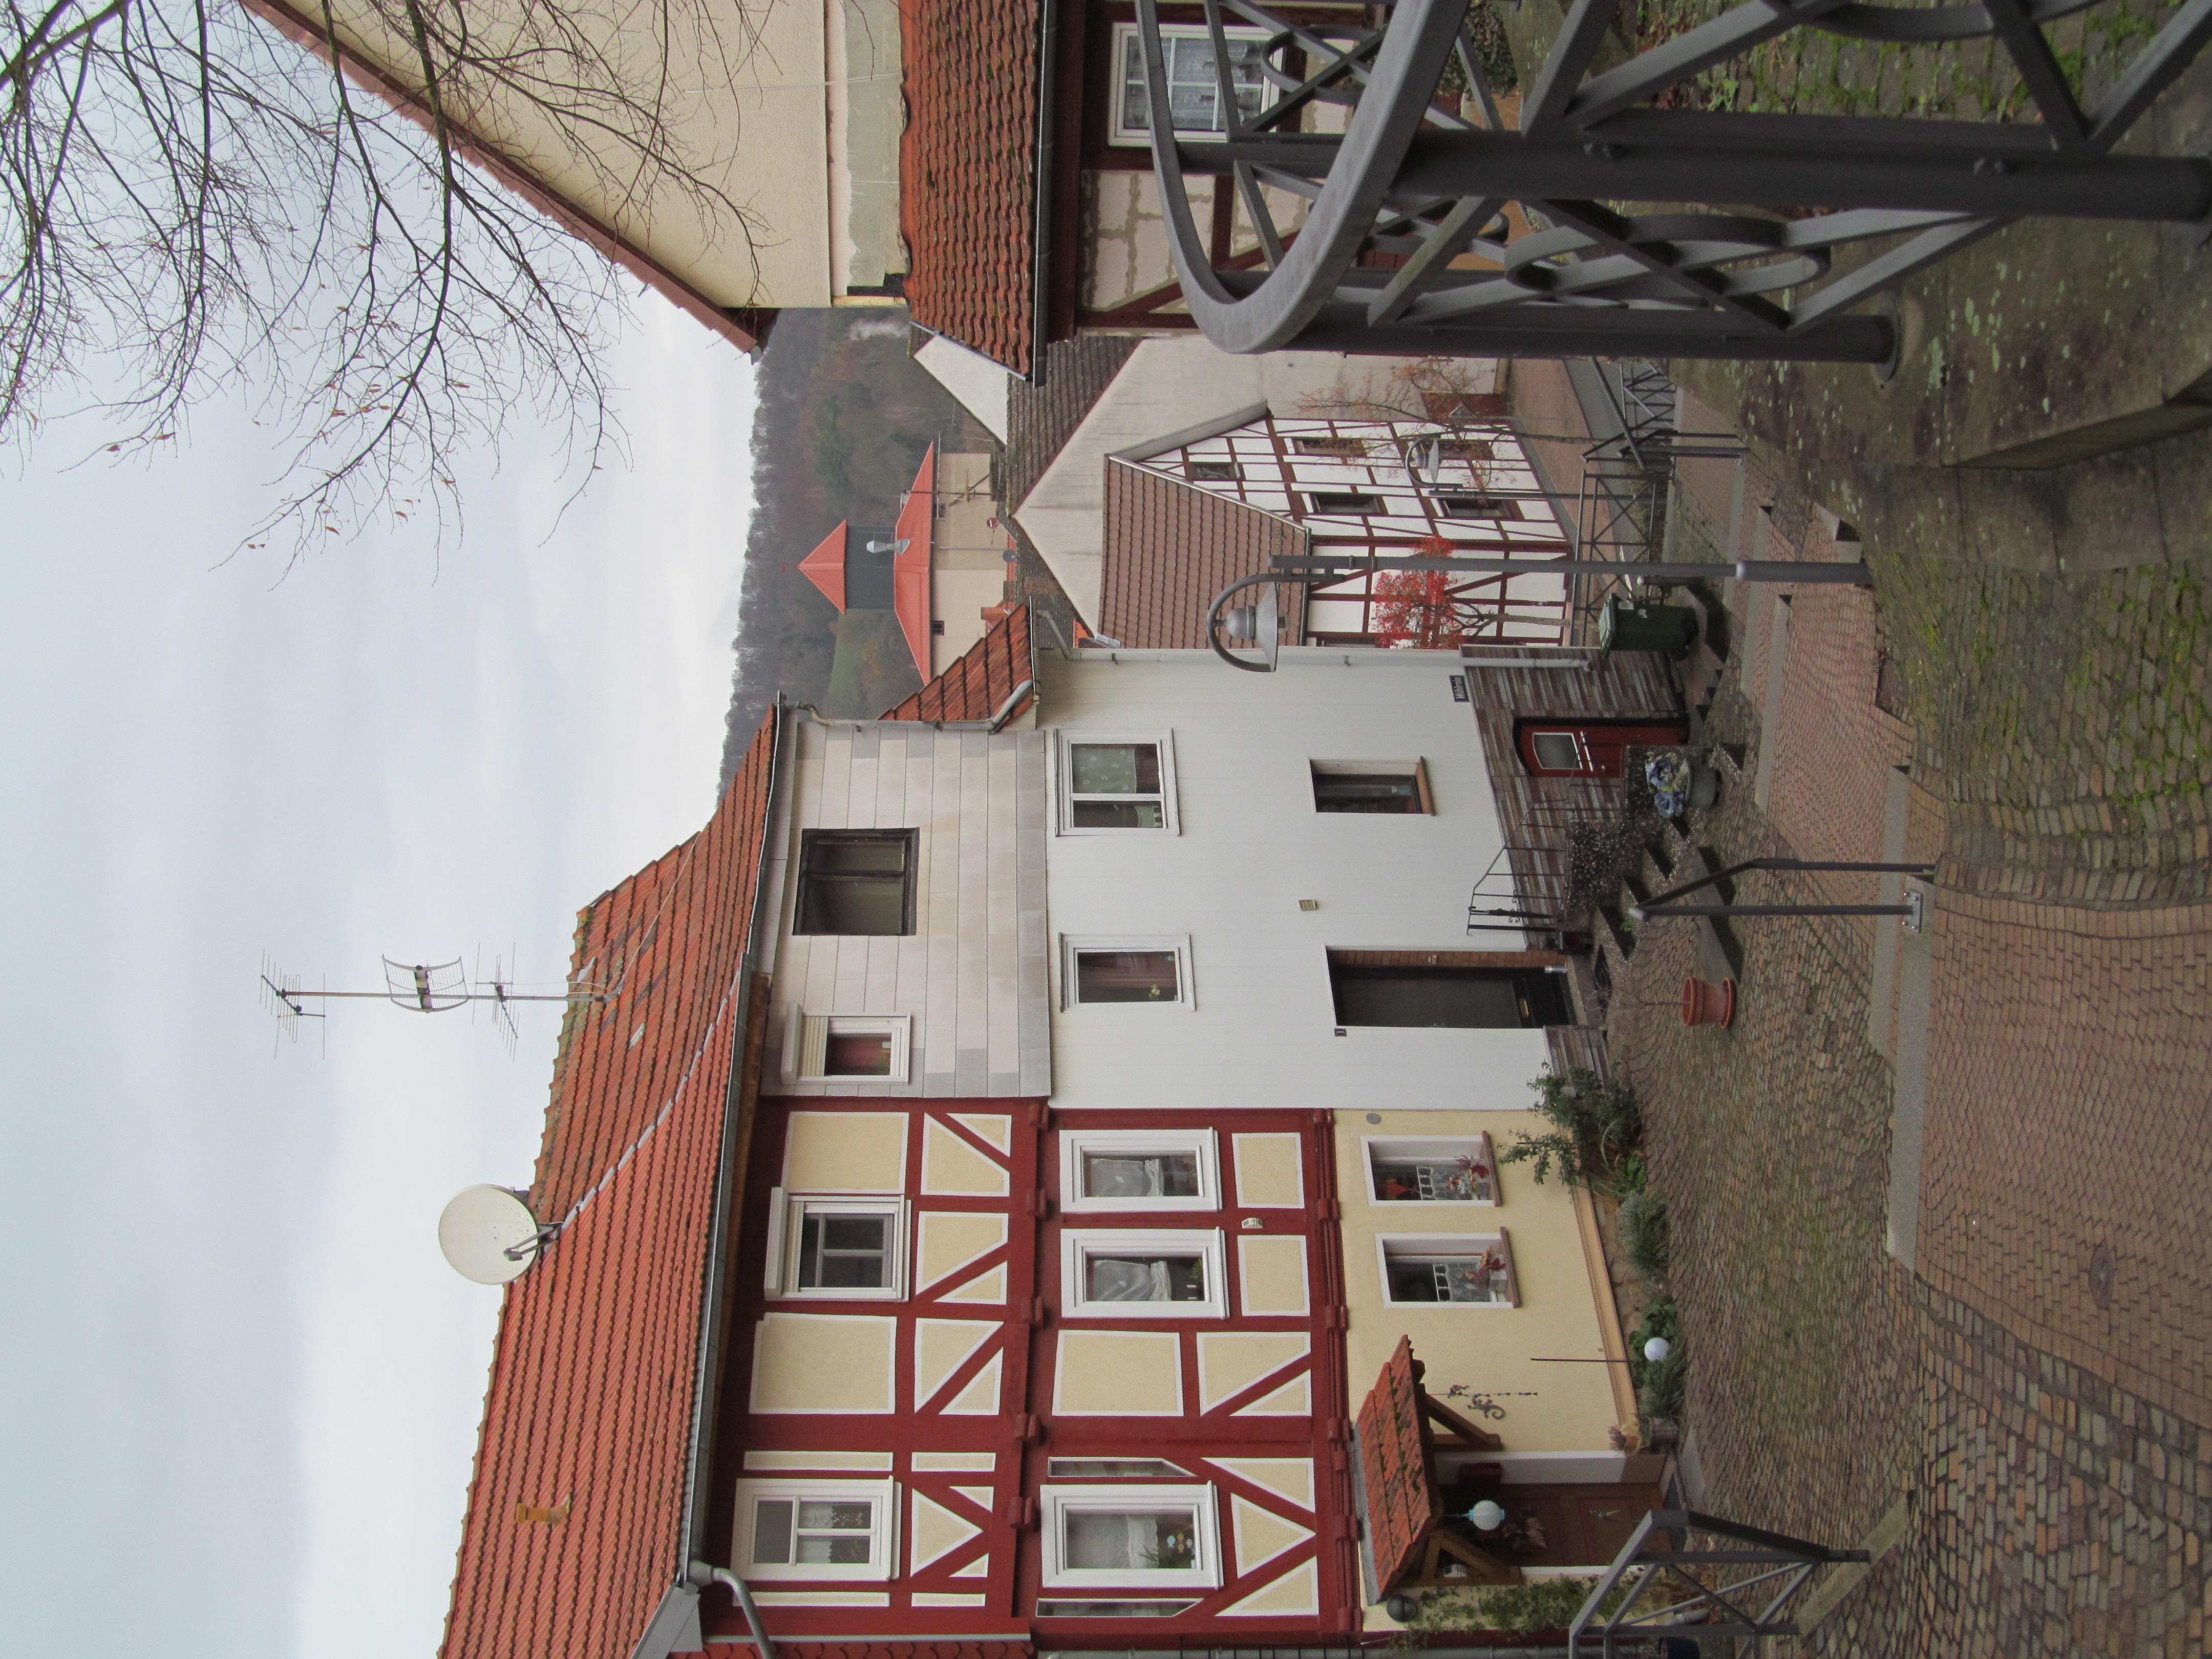 Haus sontra rotes Rotes Haus